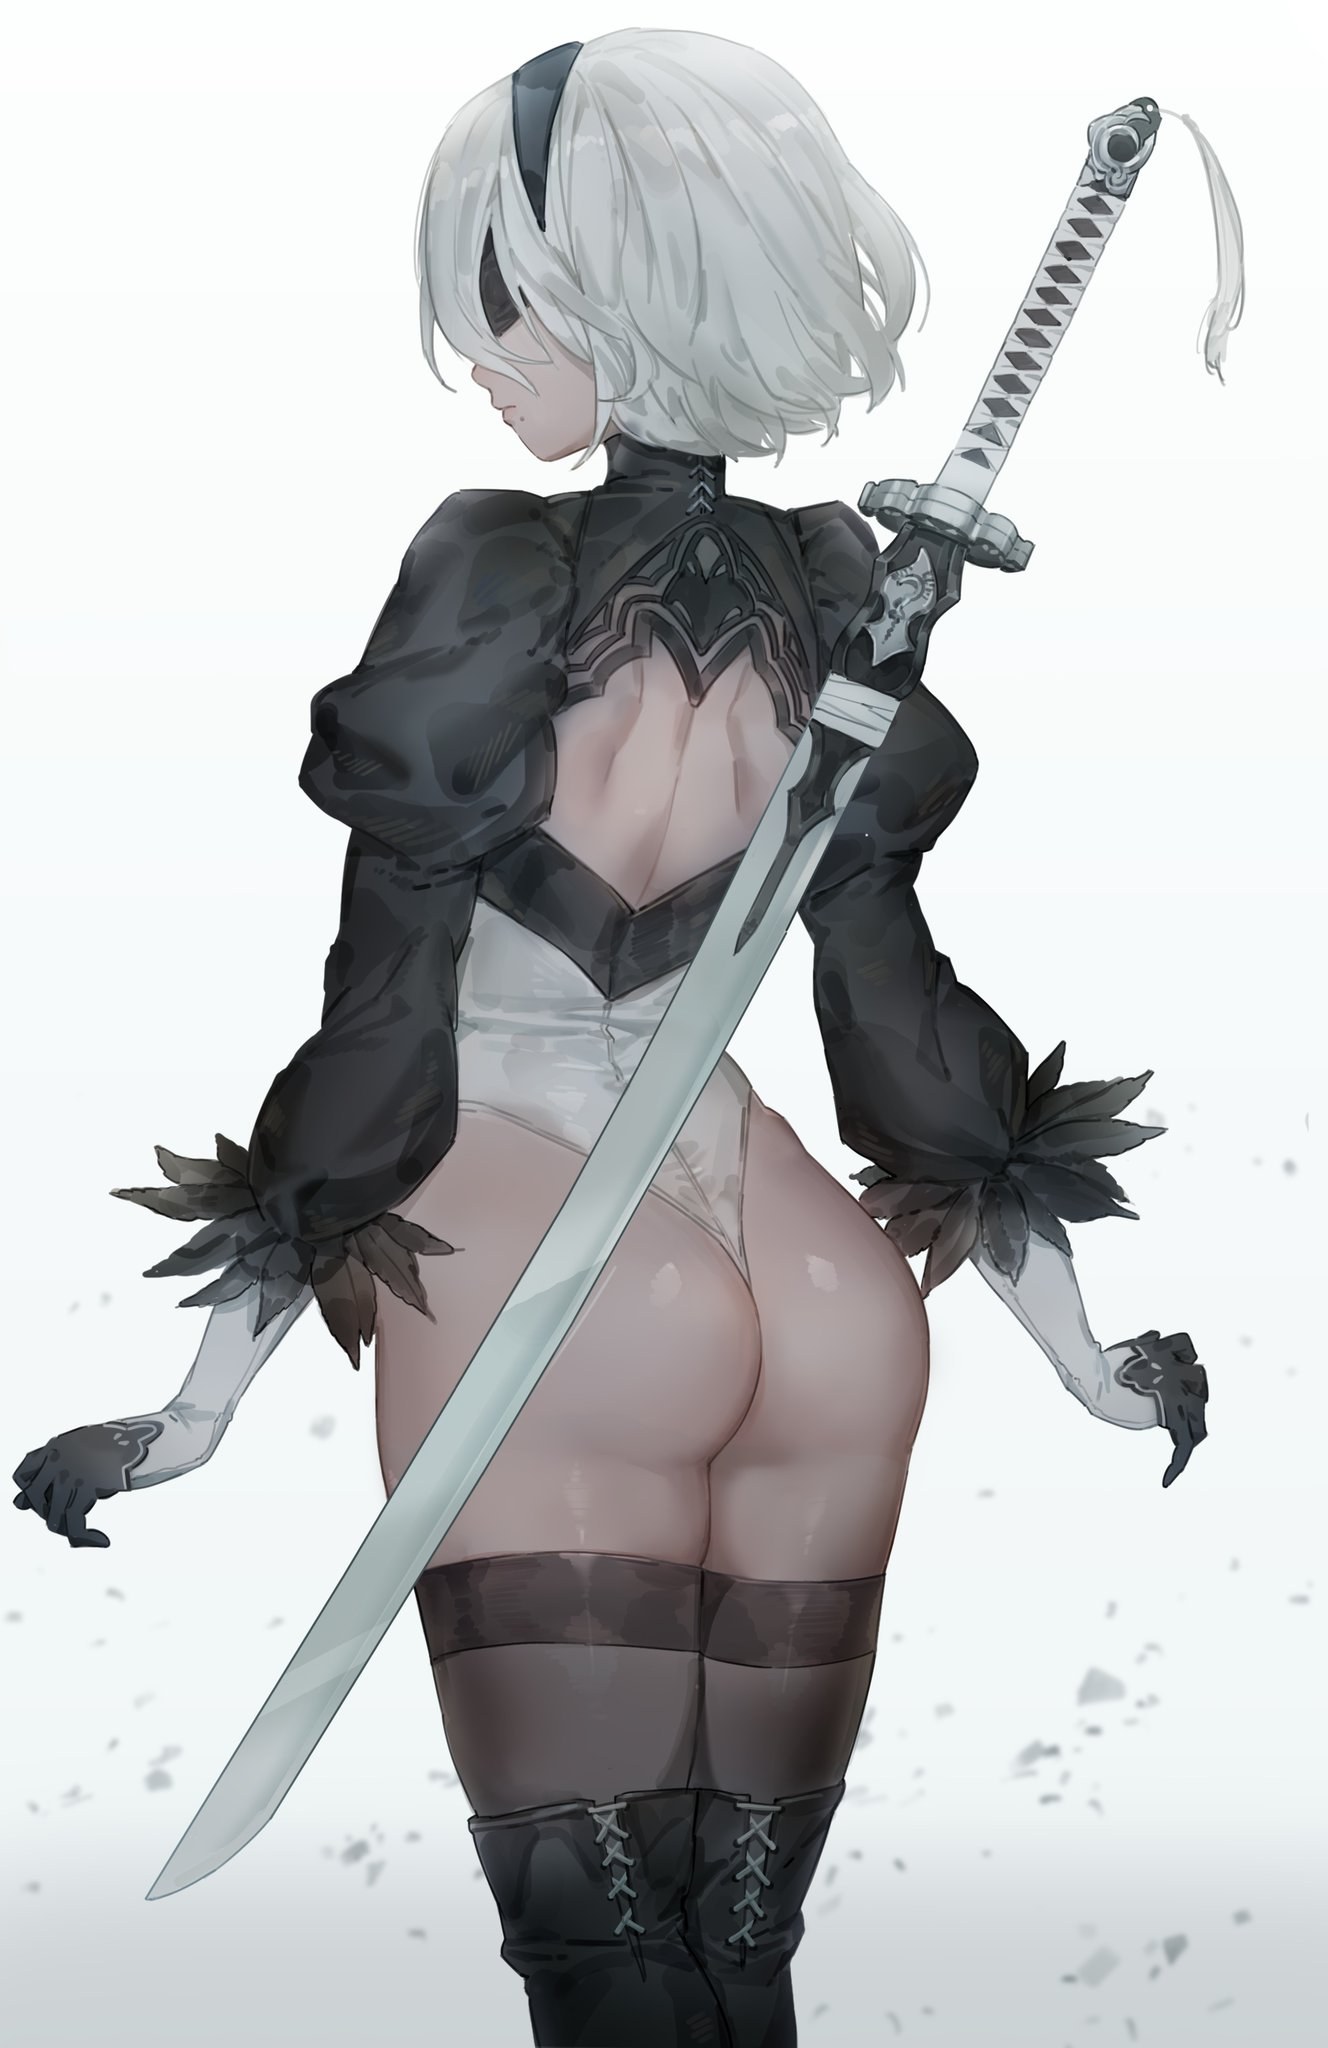 Anime 1328x2048 Nier: Automata 2B (Nier: Automata) Yorha unit no.2 type b anime girls sword katana blindfold portrait display ass NieR